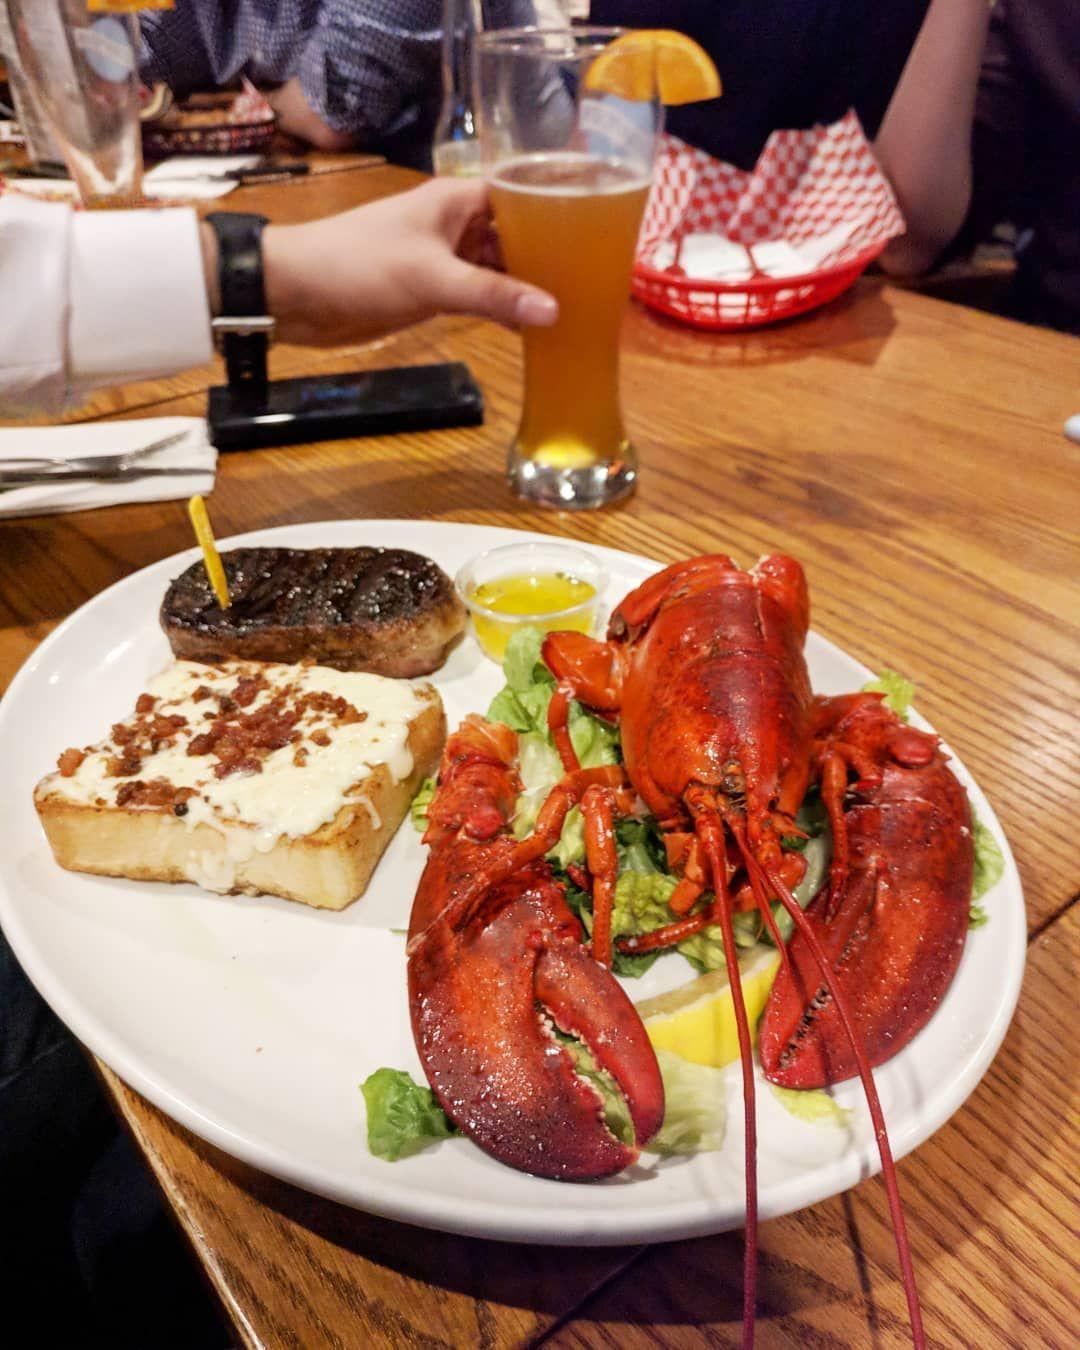 Steak and lobster proper Nova Scotia dinner ...